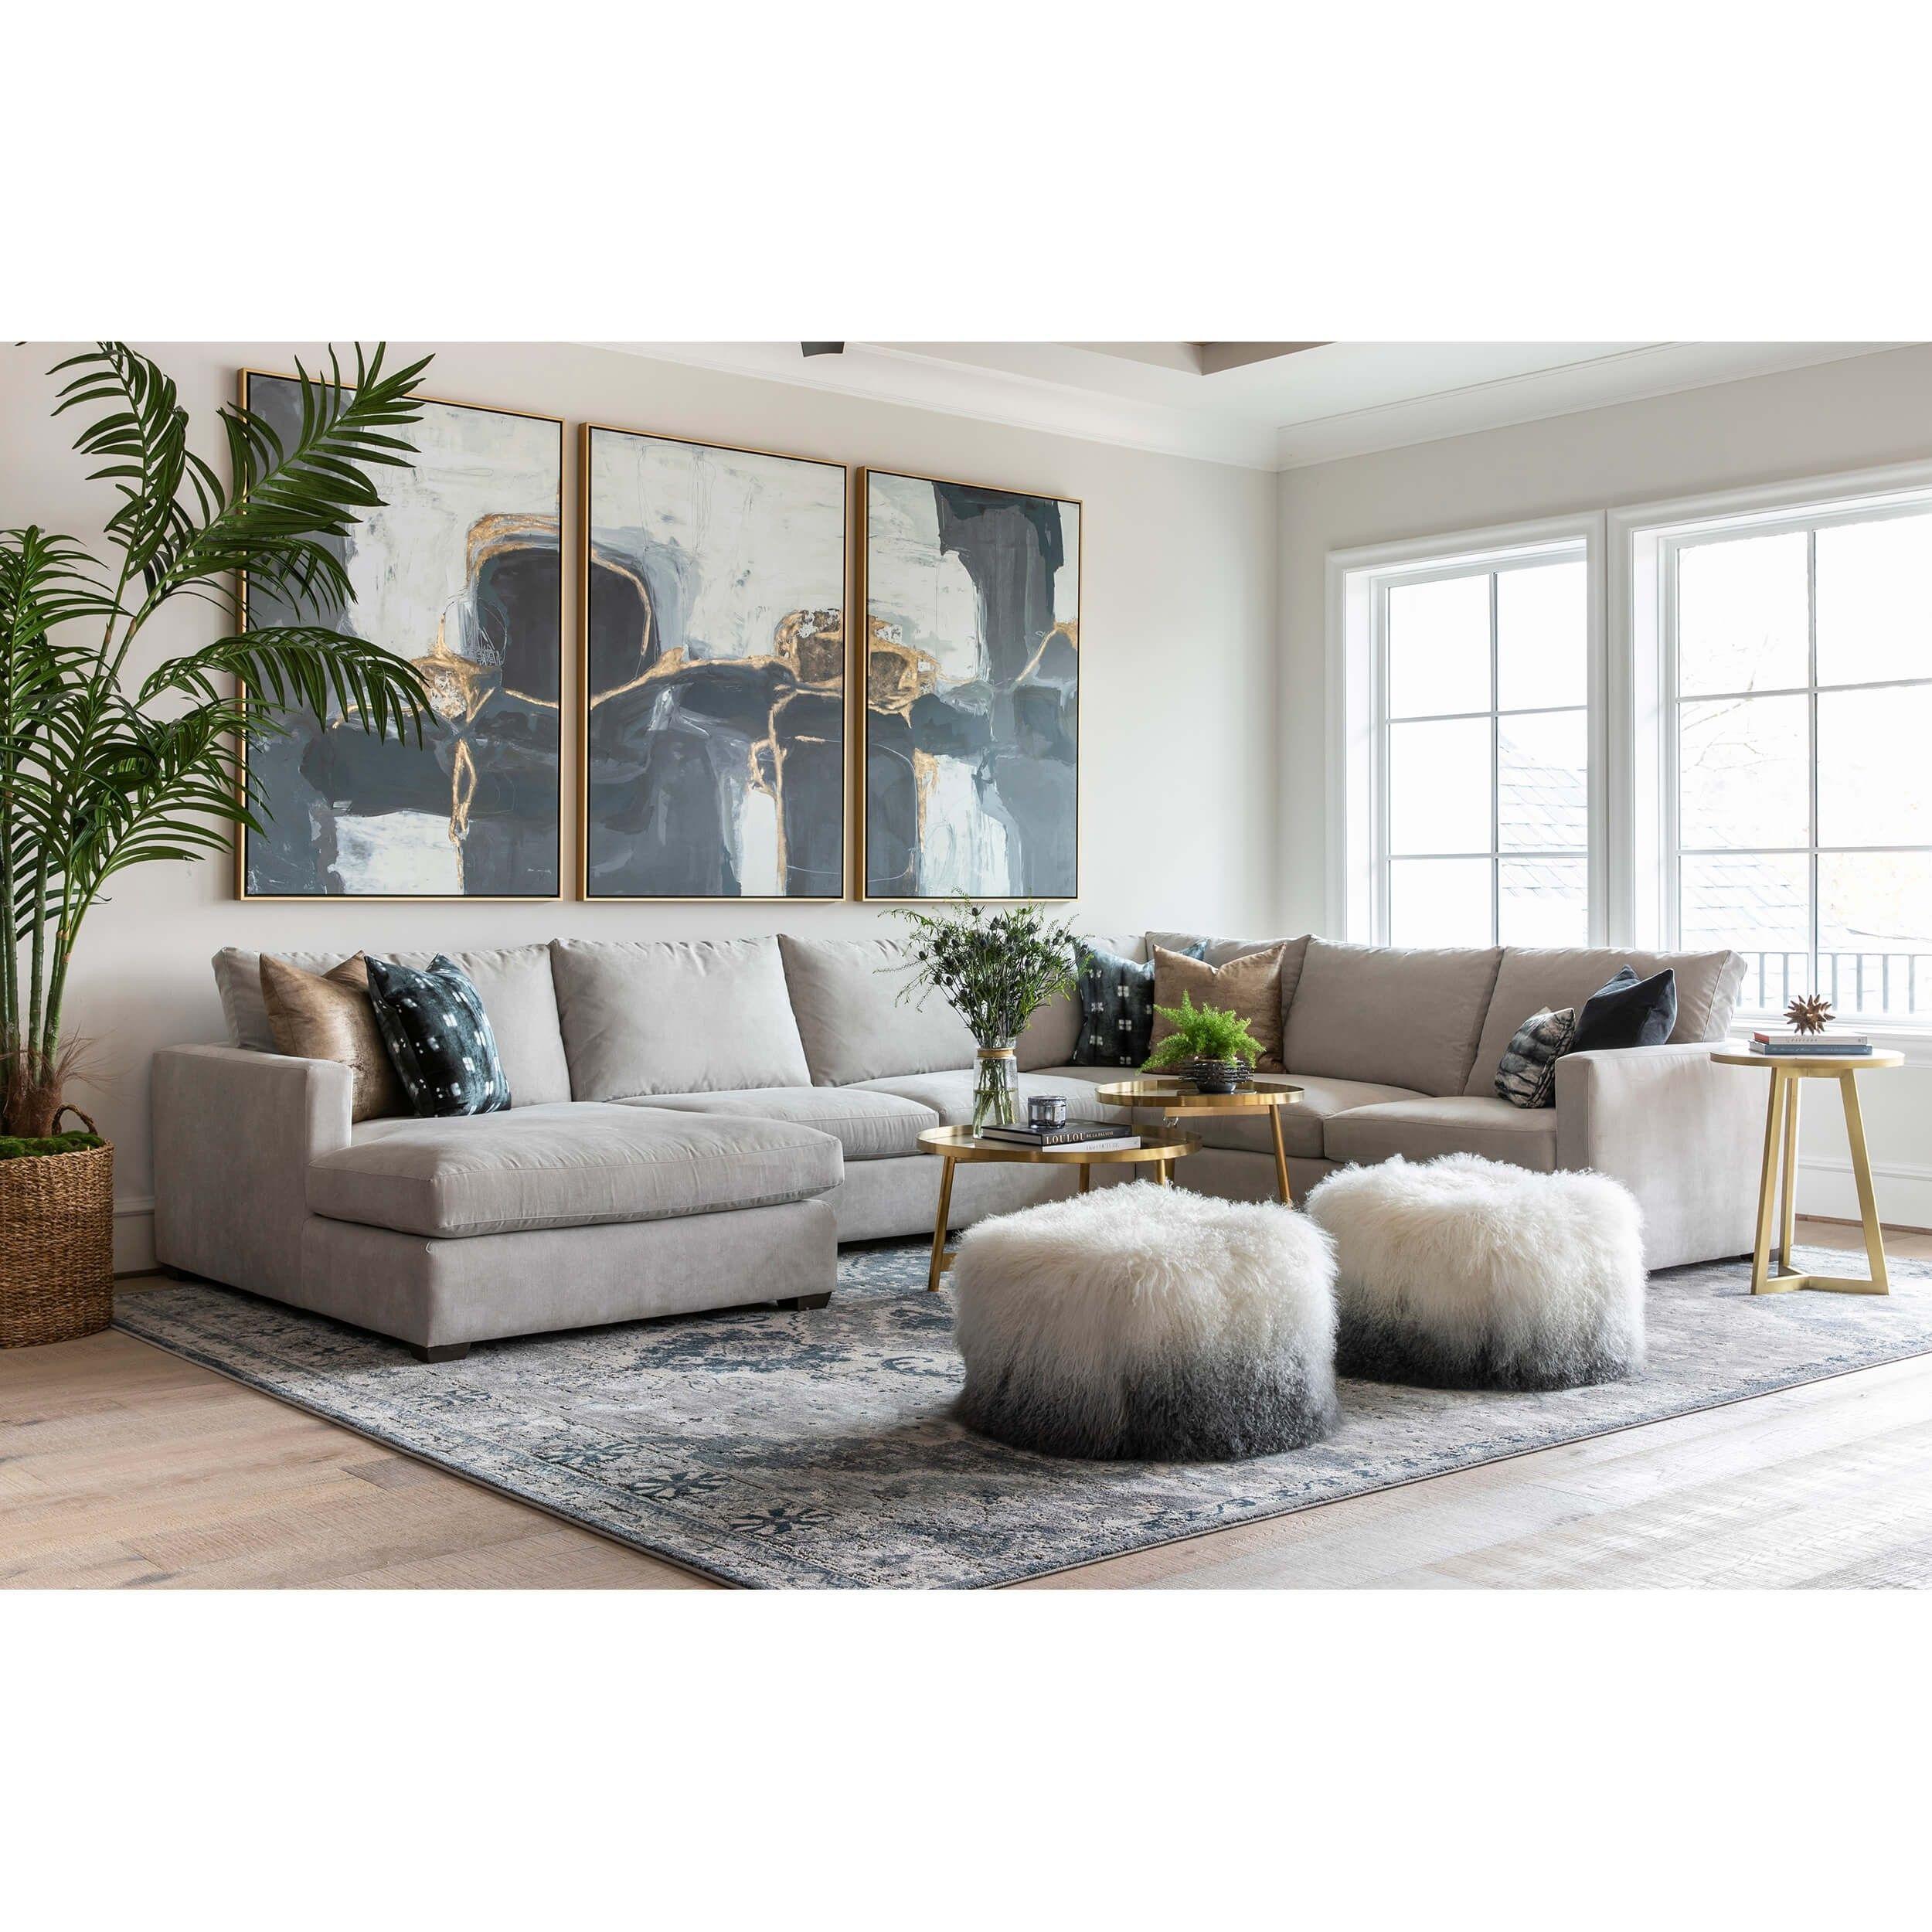 Sofa Set For Drawing Room Buy Chair Cheap Modern Living Room